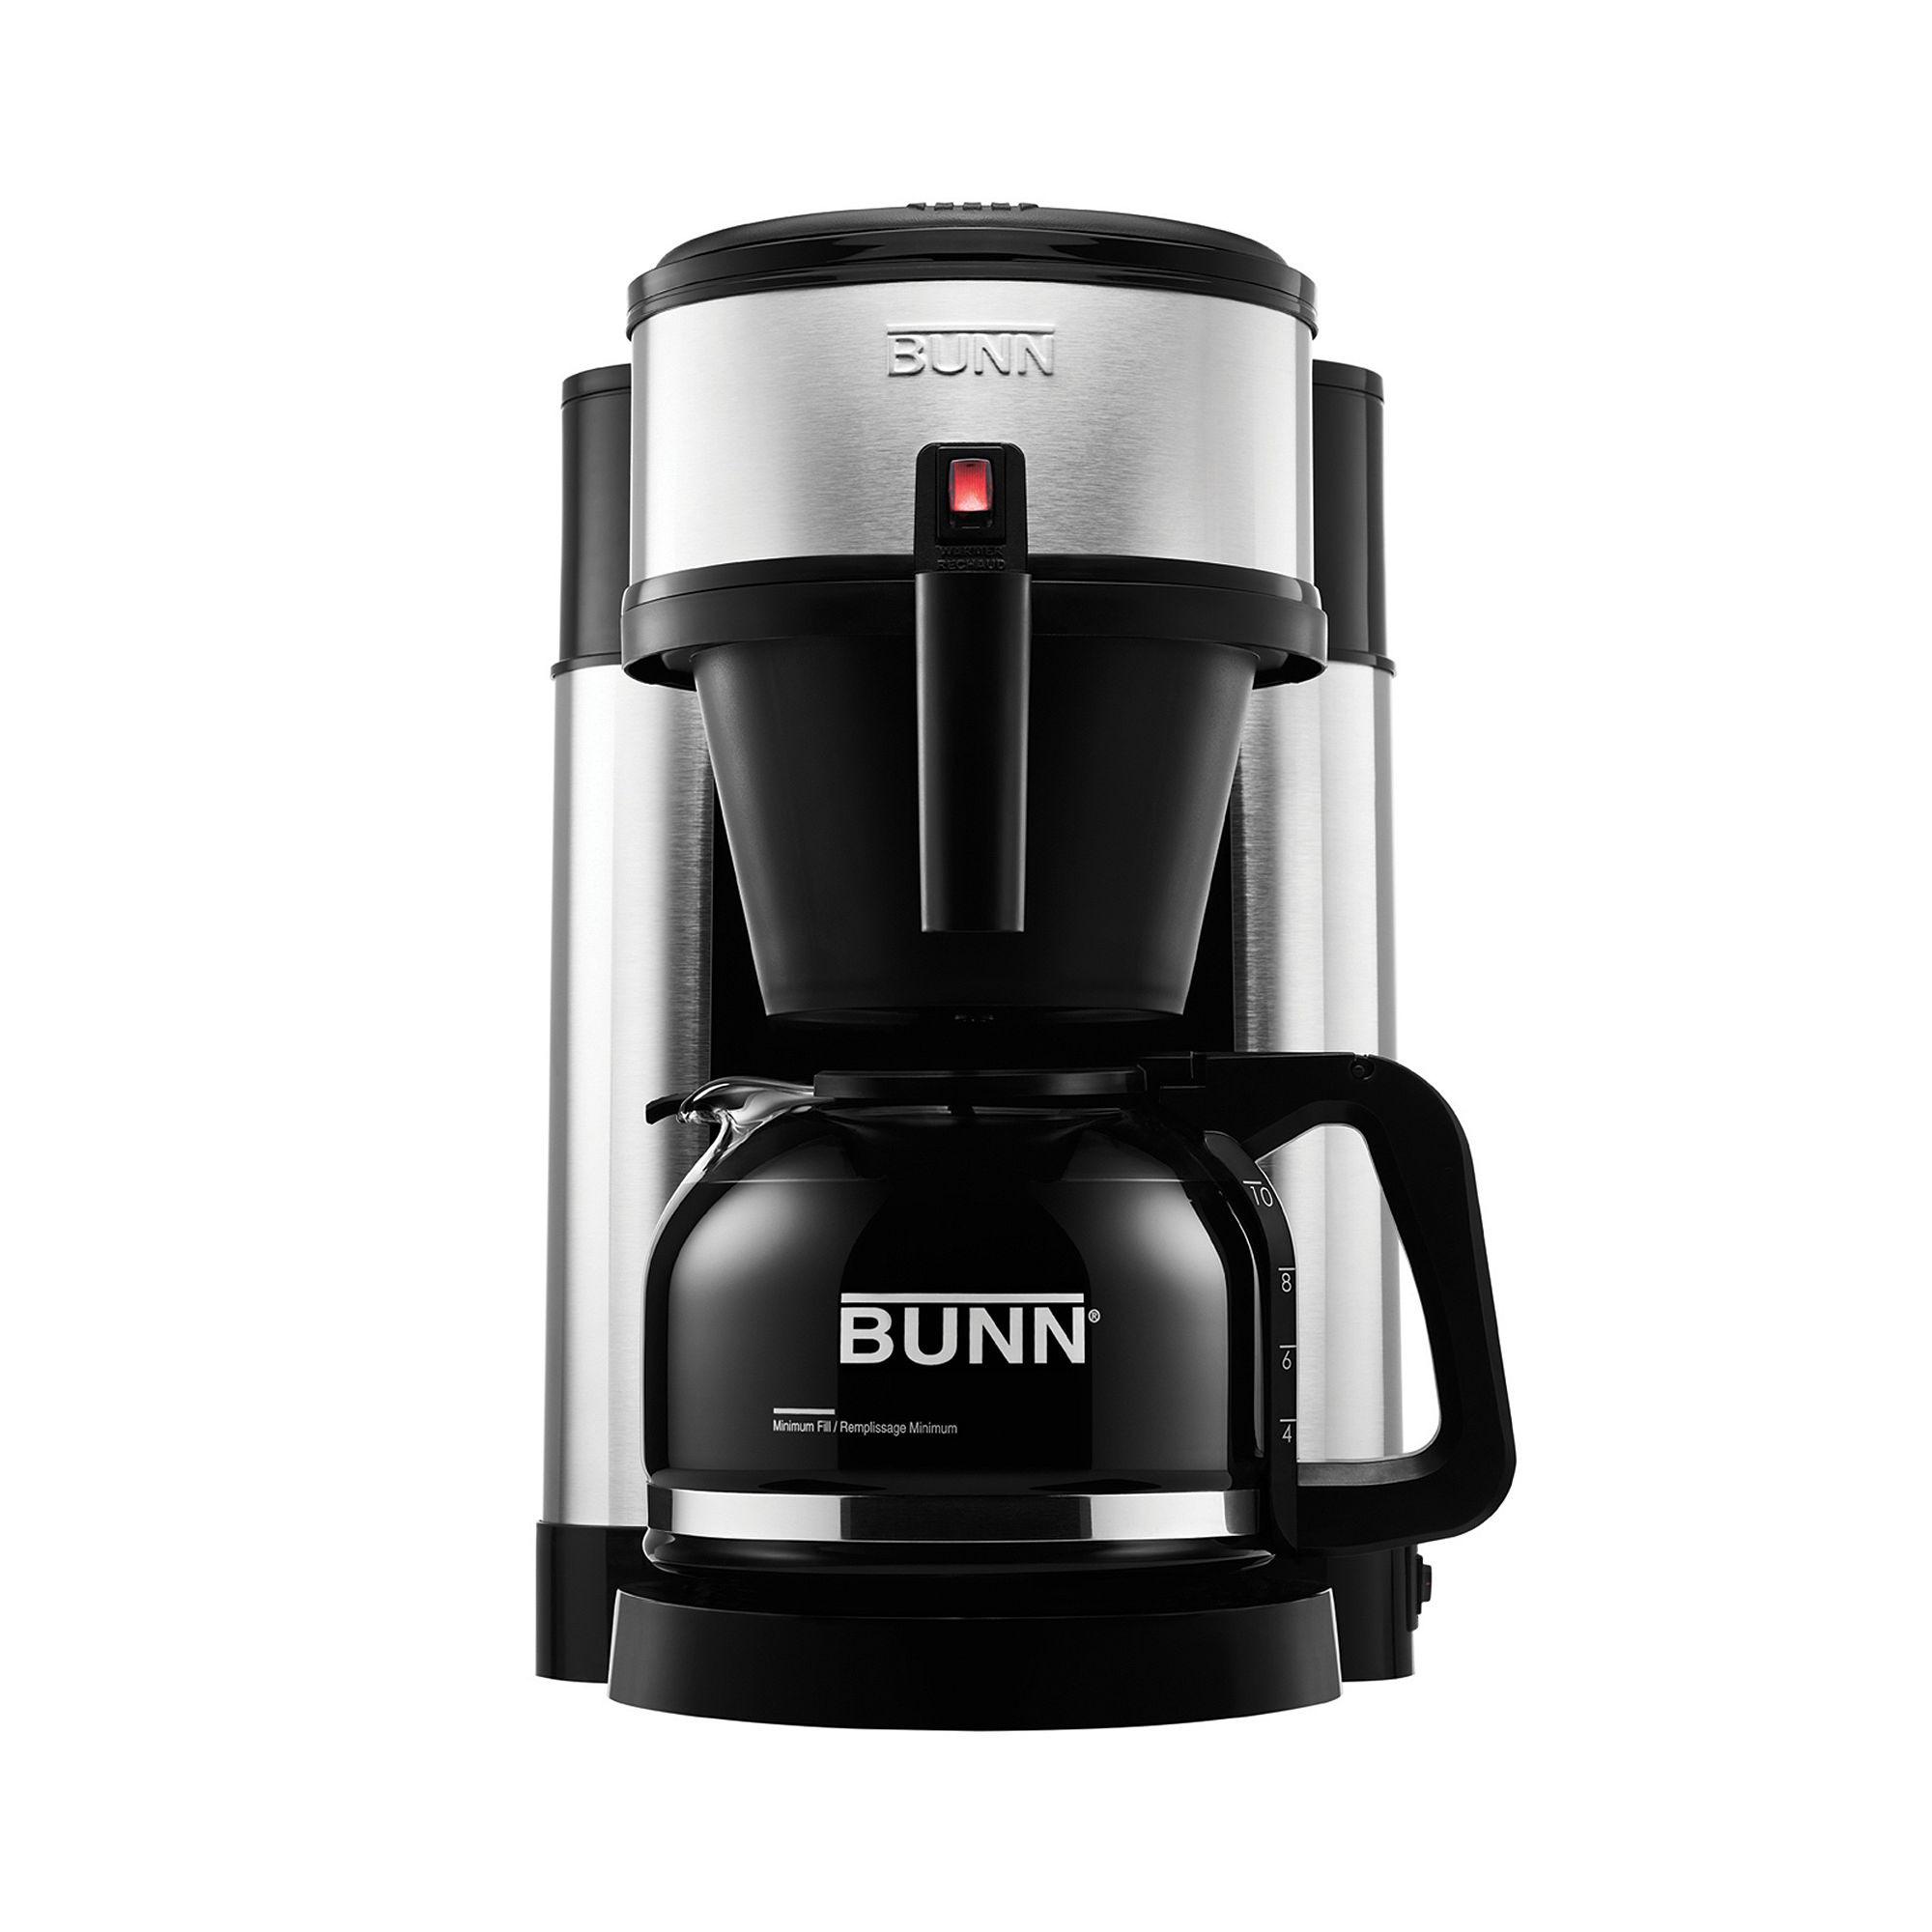 Bunn NHS Velocity Brew 10-Cup Coffee Maker